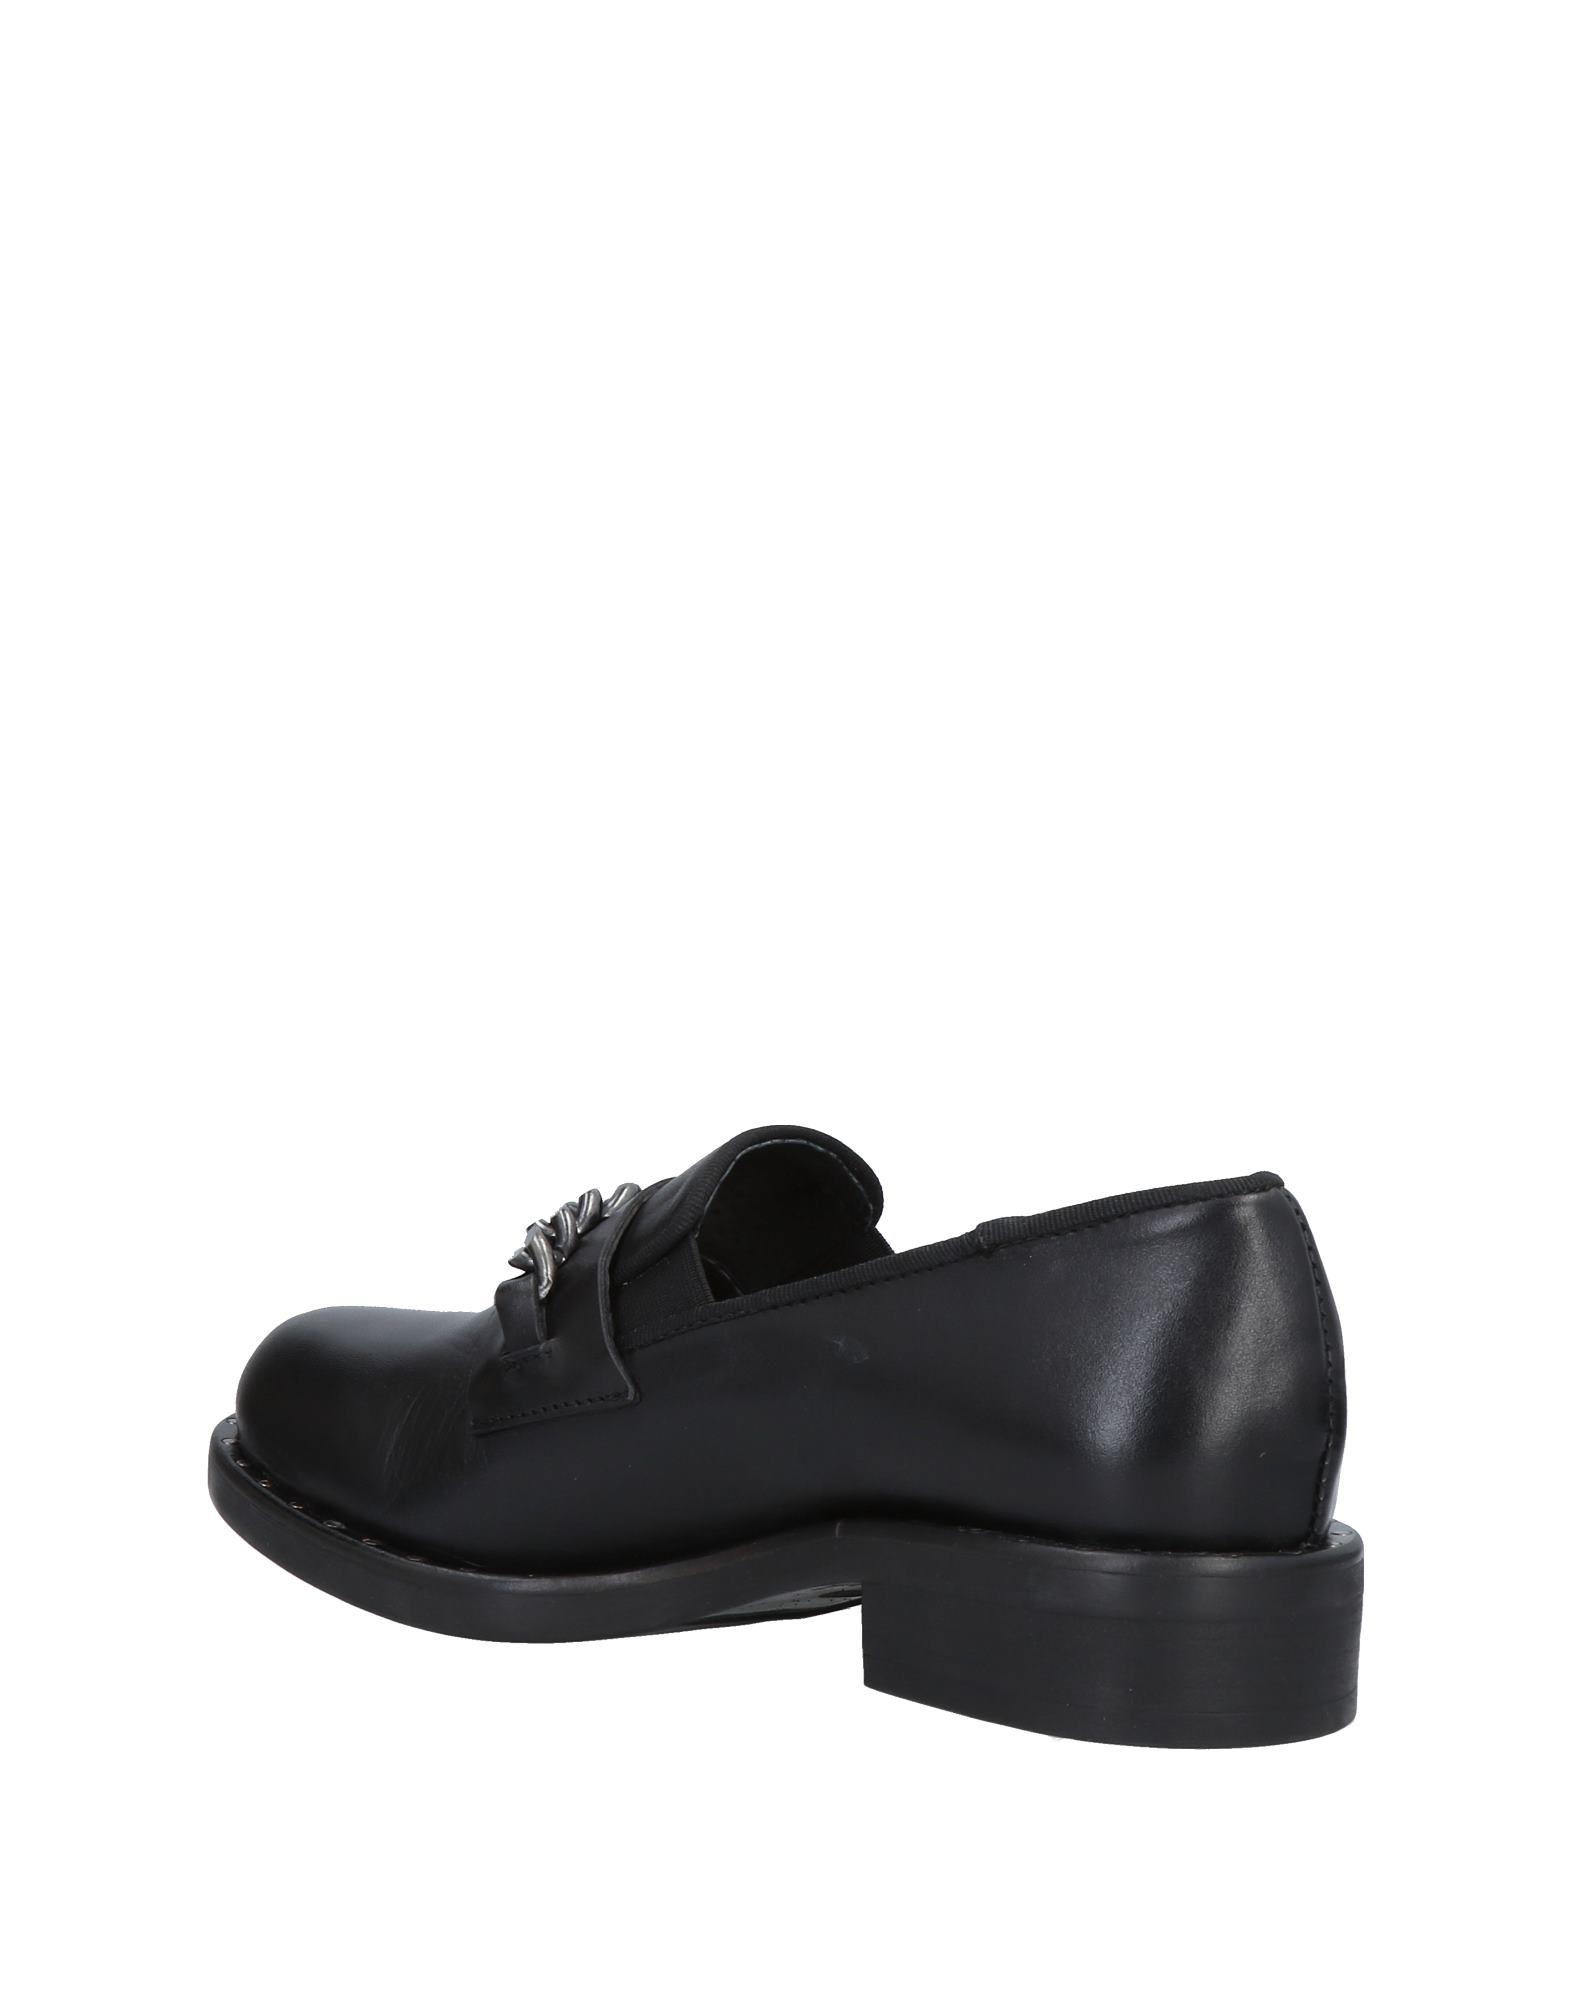 Nila Gute & Nila Mokassins Damen  11476790MM Gute Nila Qualität beliebte Schuhe 70dda1